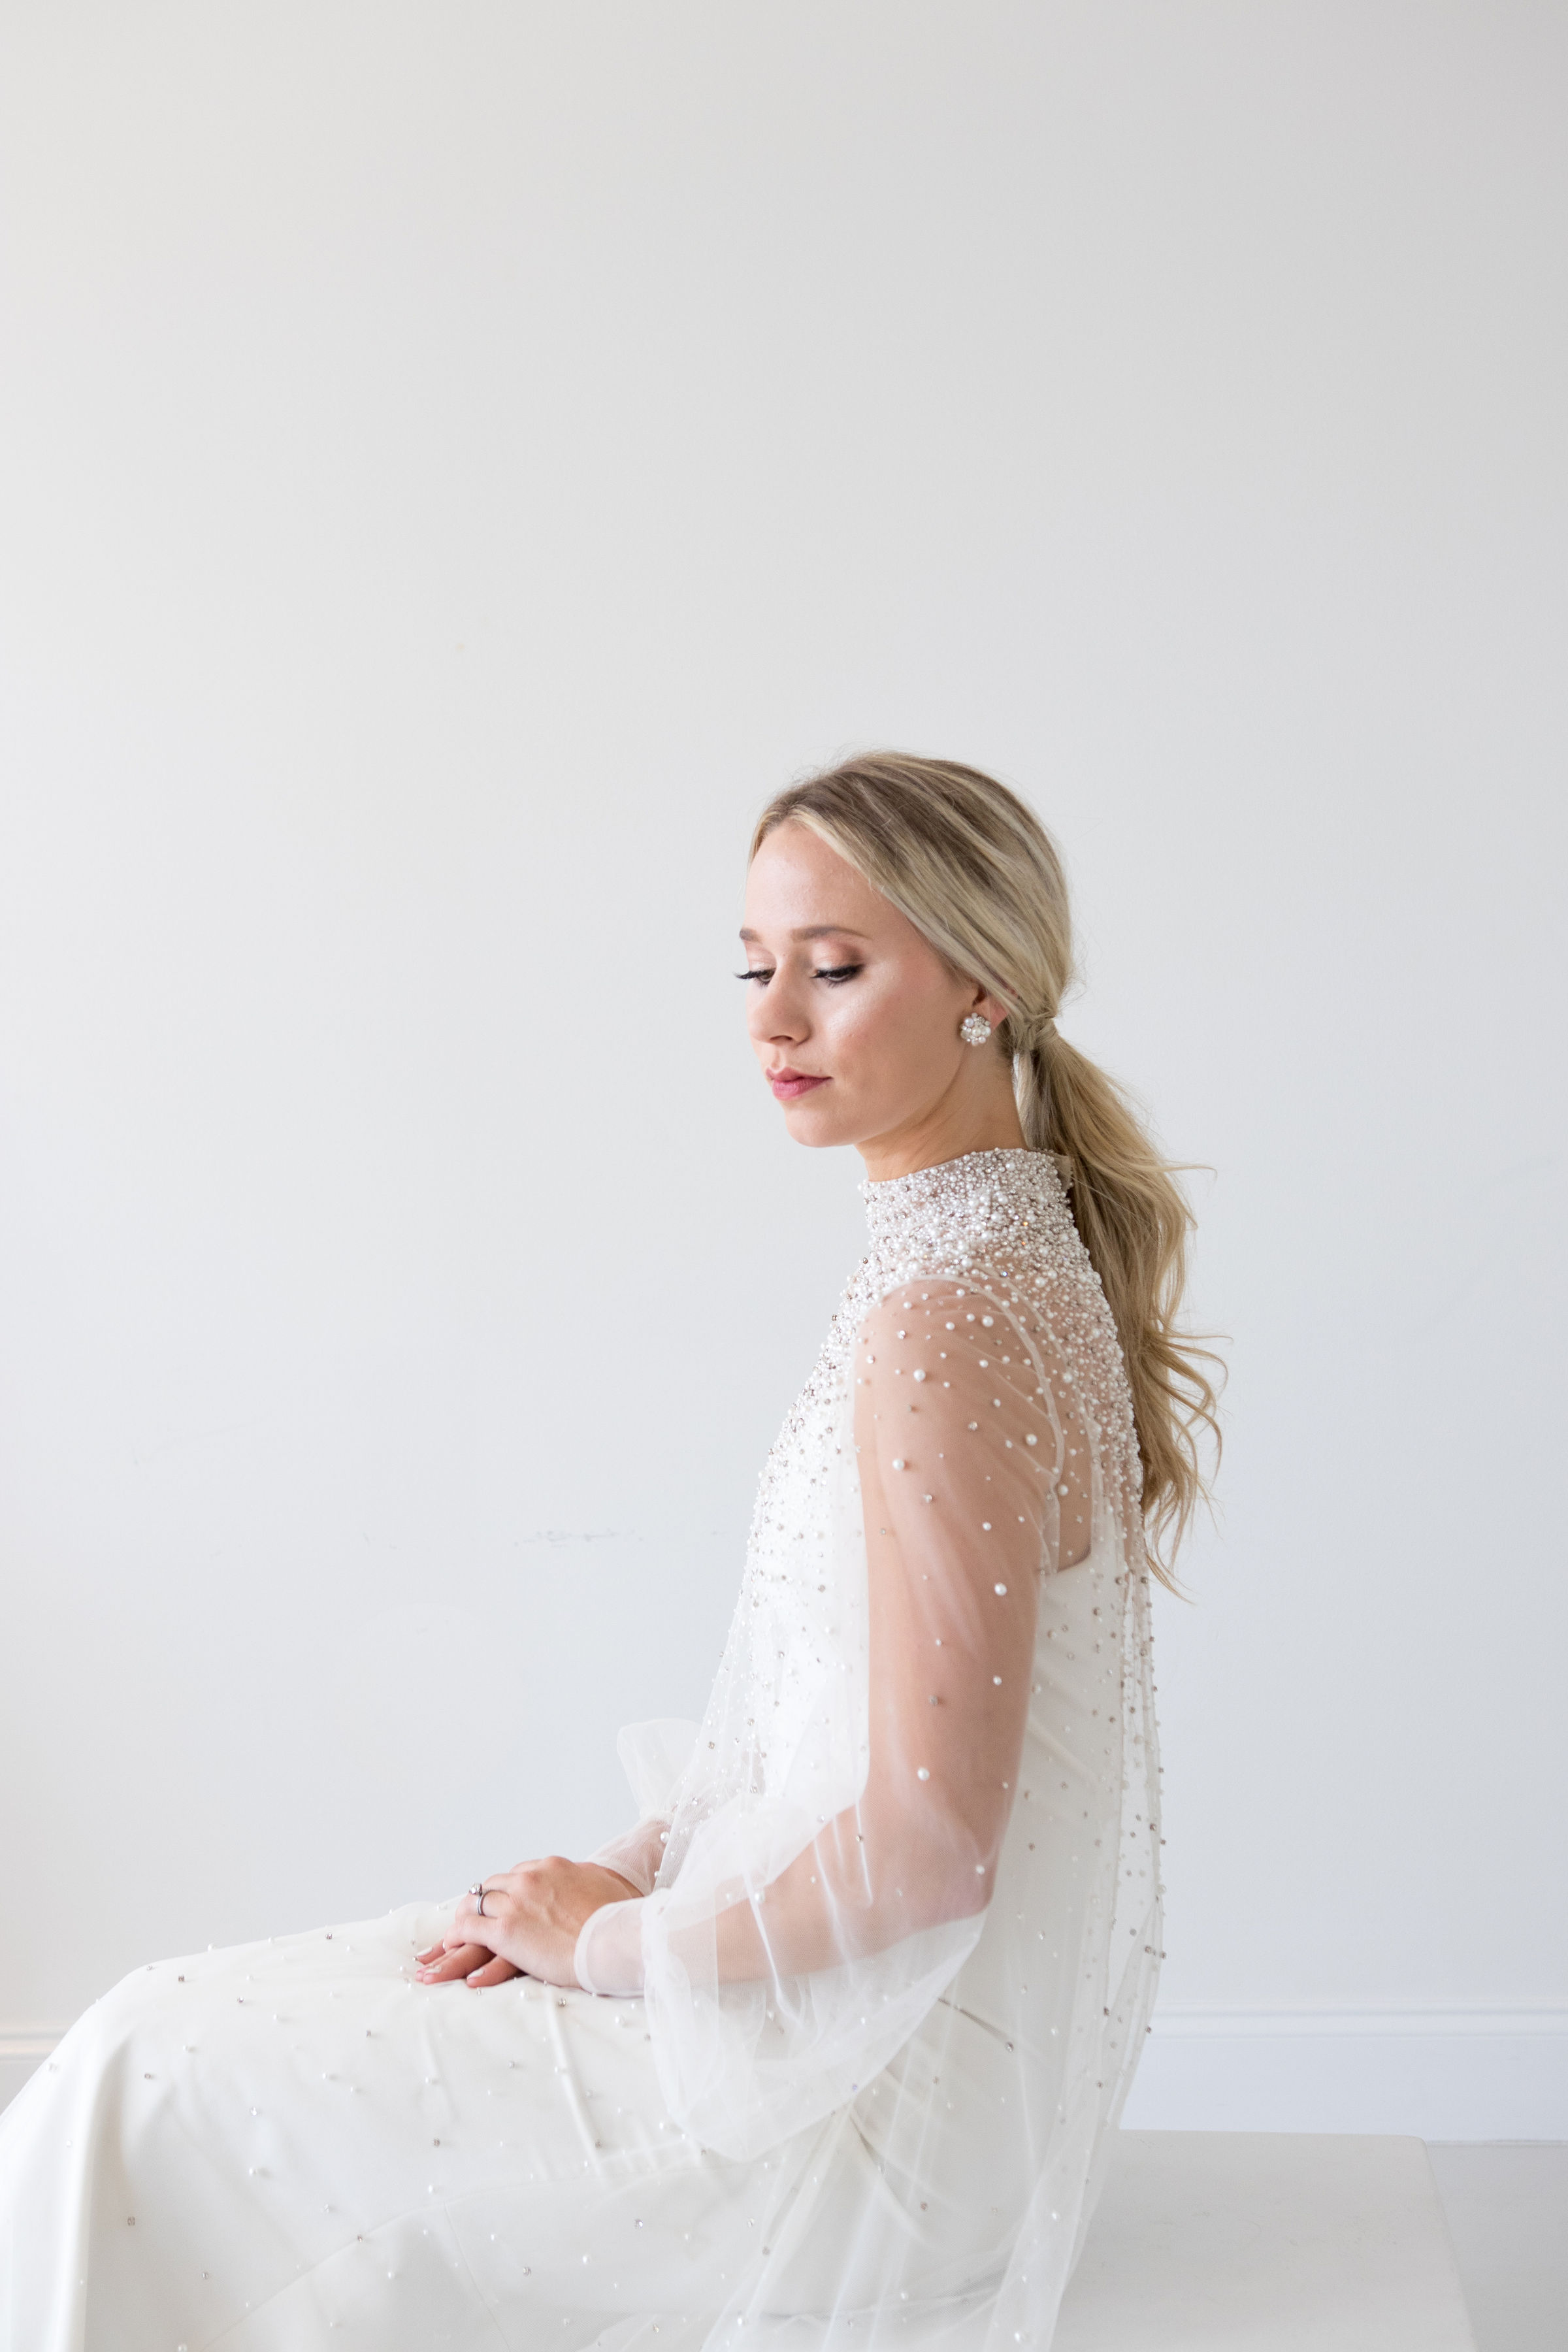 Allison Webb - Photography by  Morgan Newsom Photography